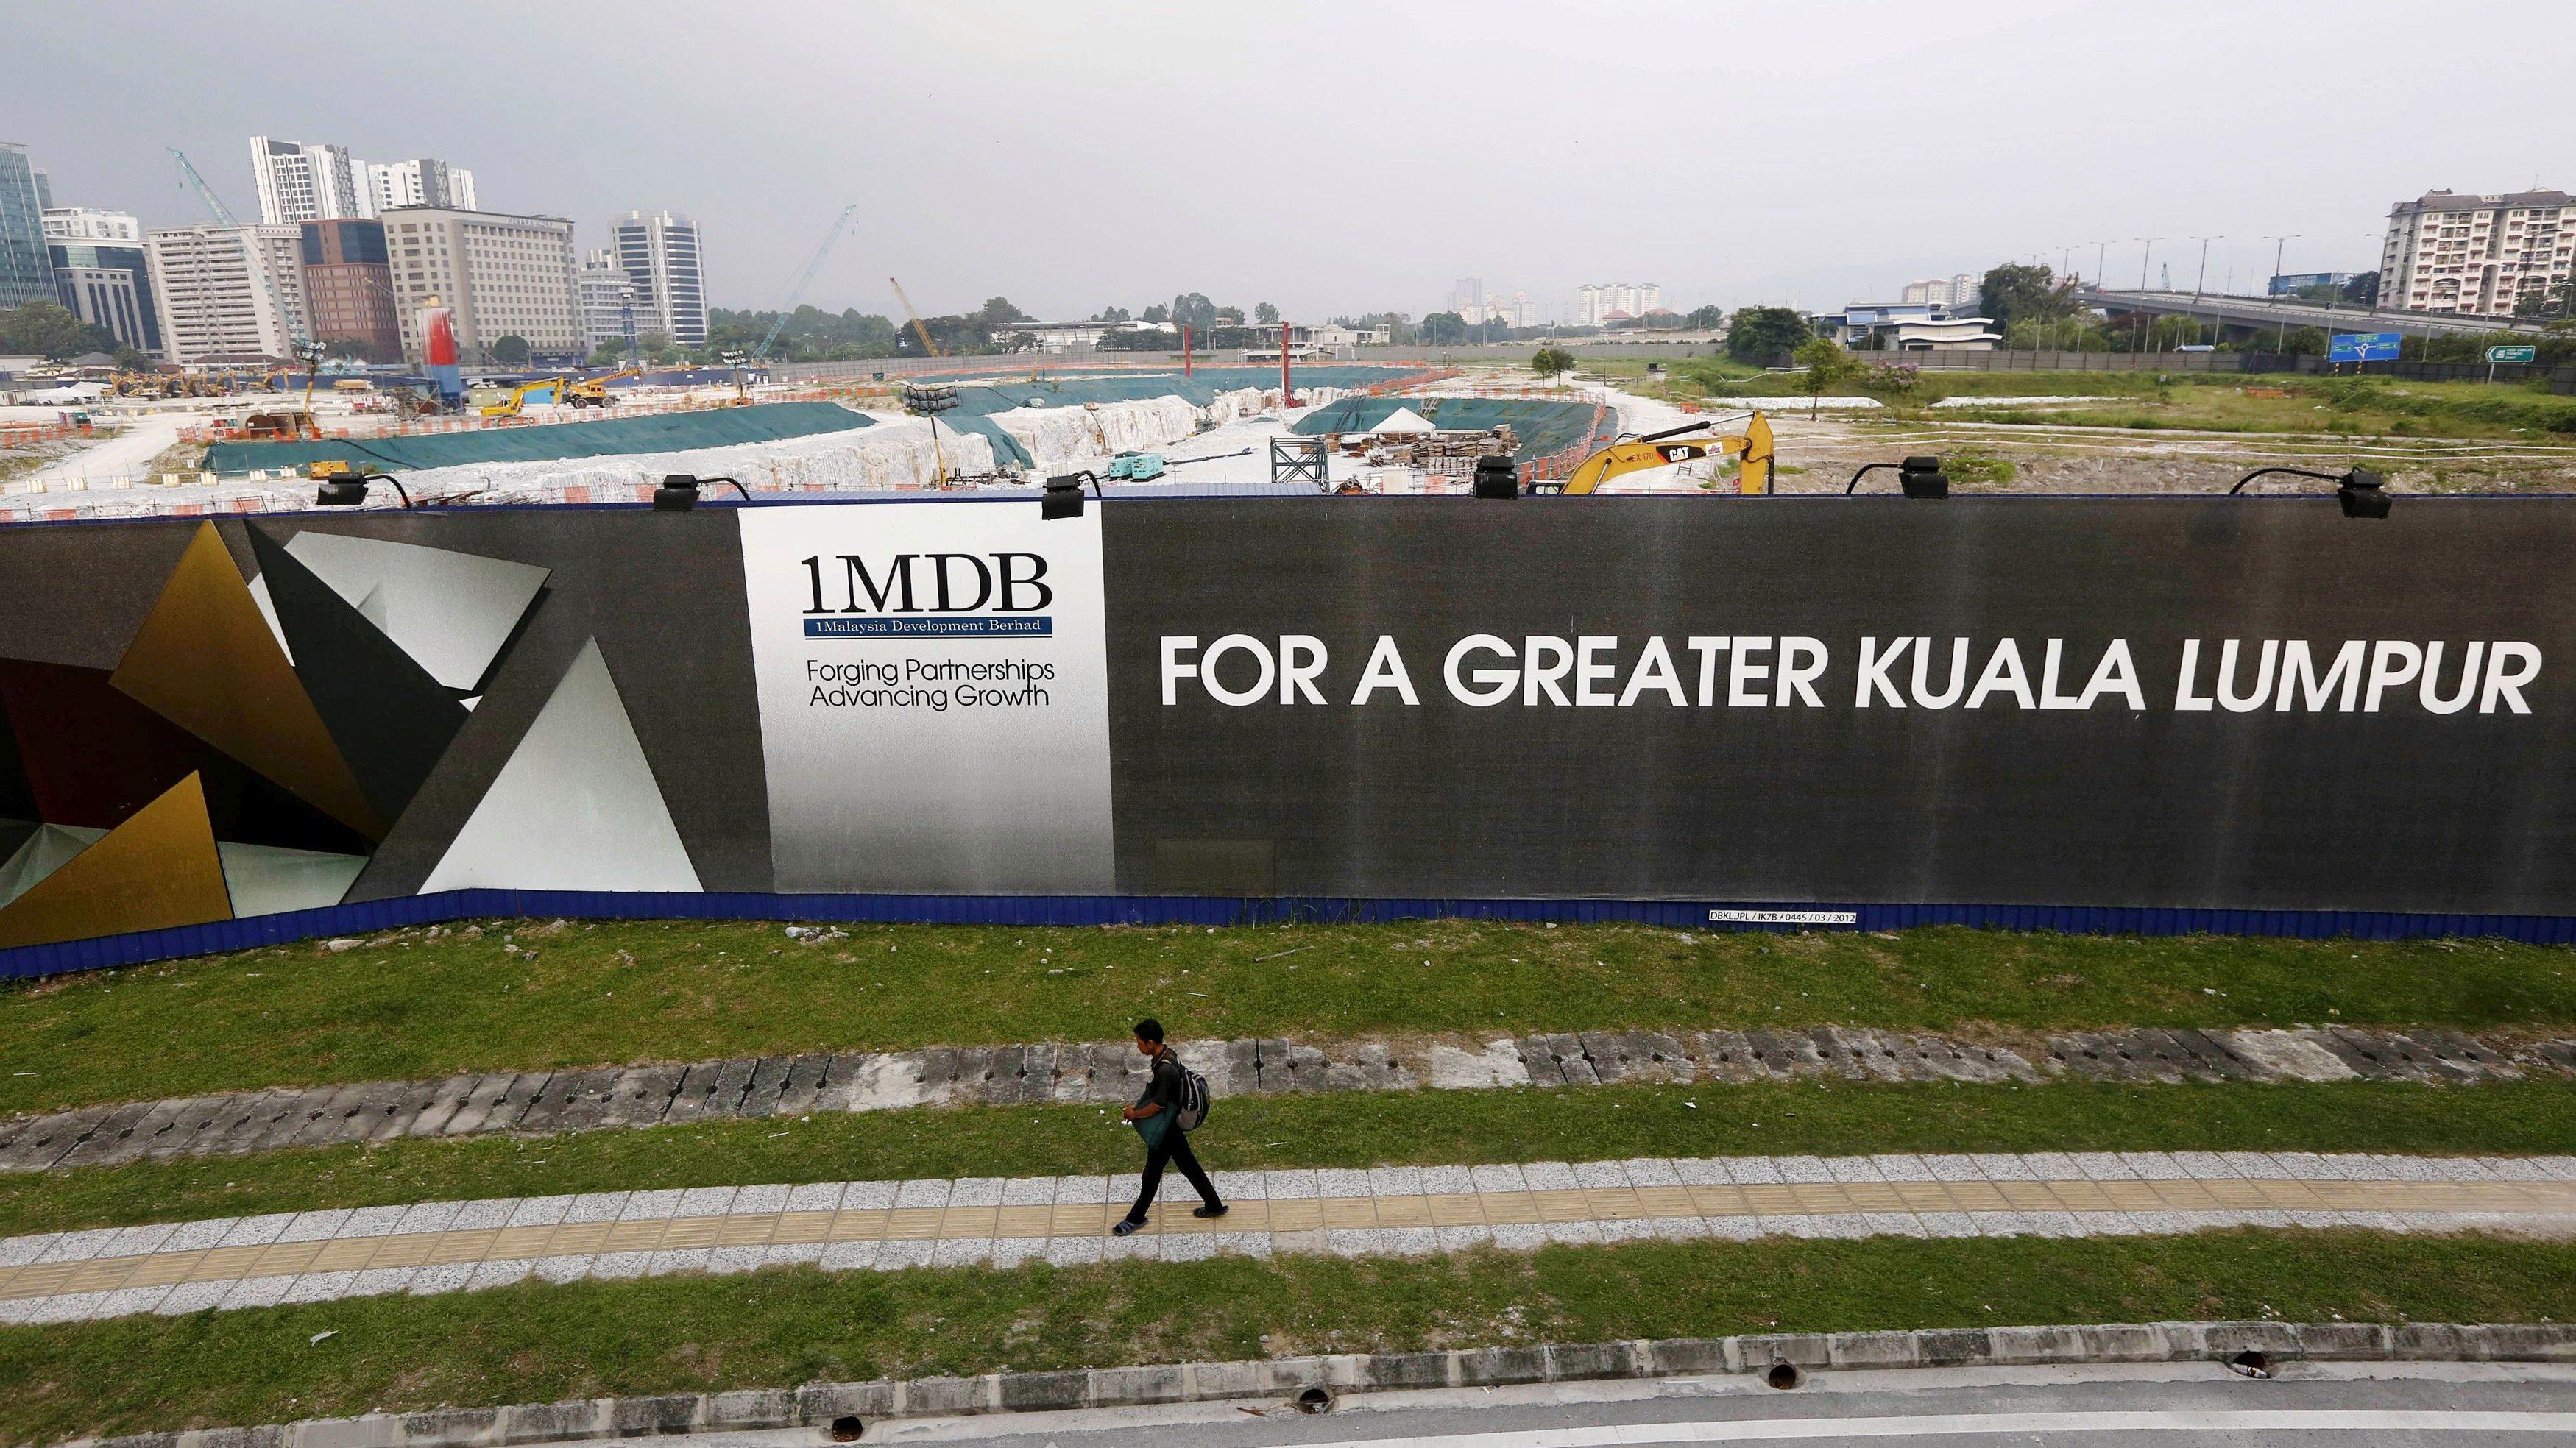 A man walks past a 1 Malaysia Development Berhad (1MDB) billboard at the funds flagship Tun Razak Exchange development in Kuala Lumpur, in this March 1, 2015 file photo.